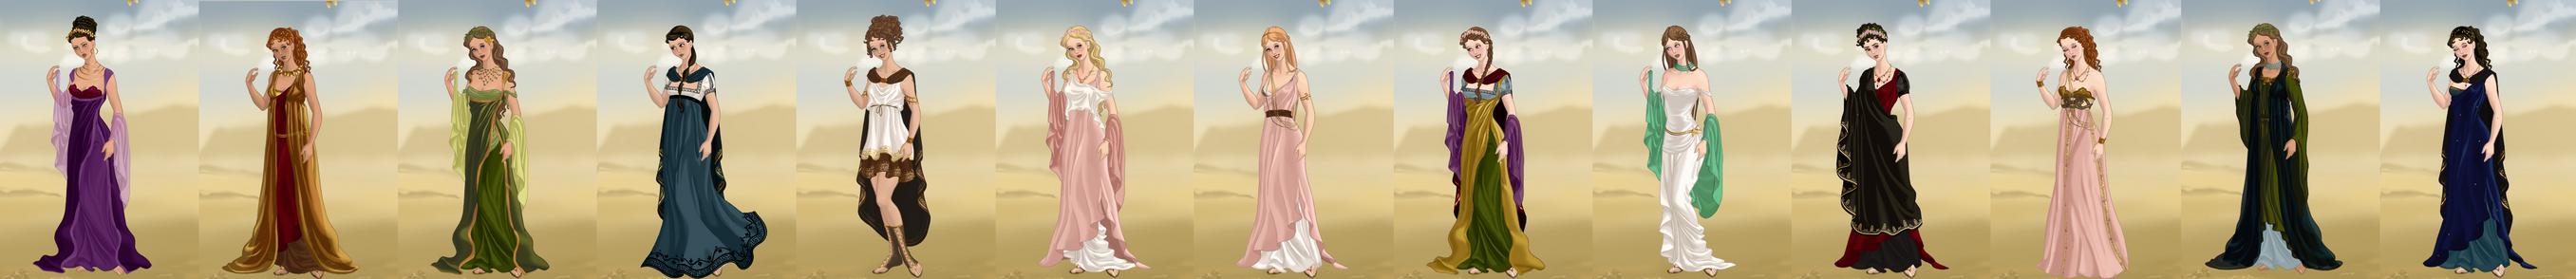 Greek goddesses by Failinginart